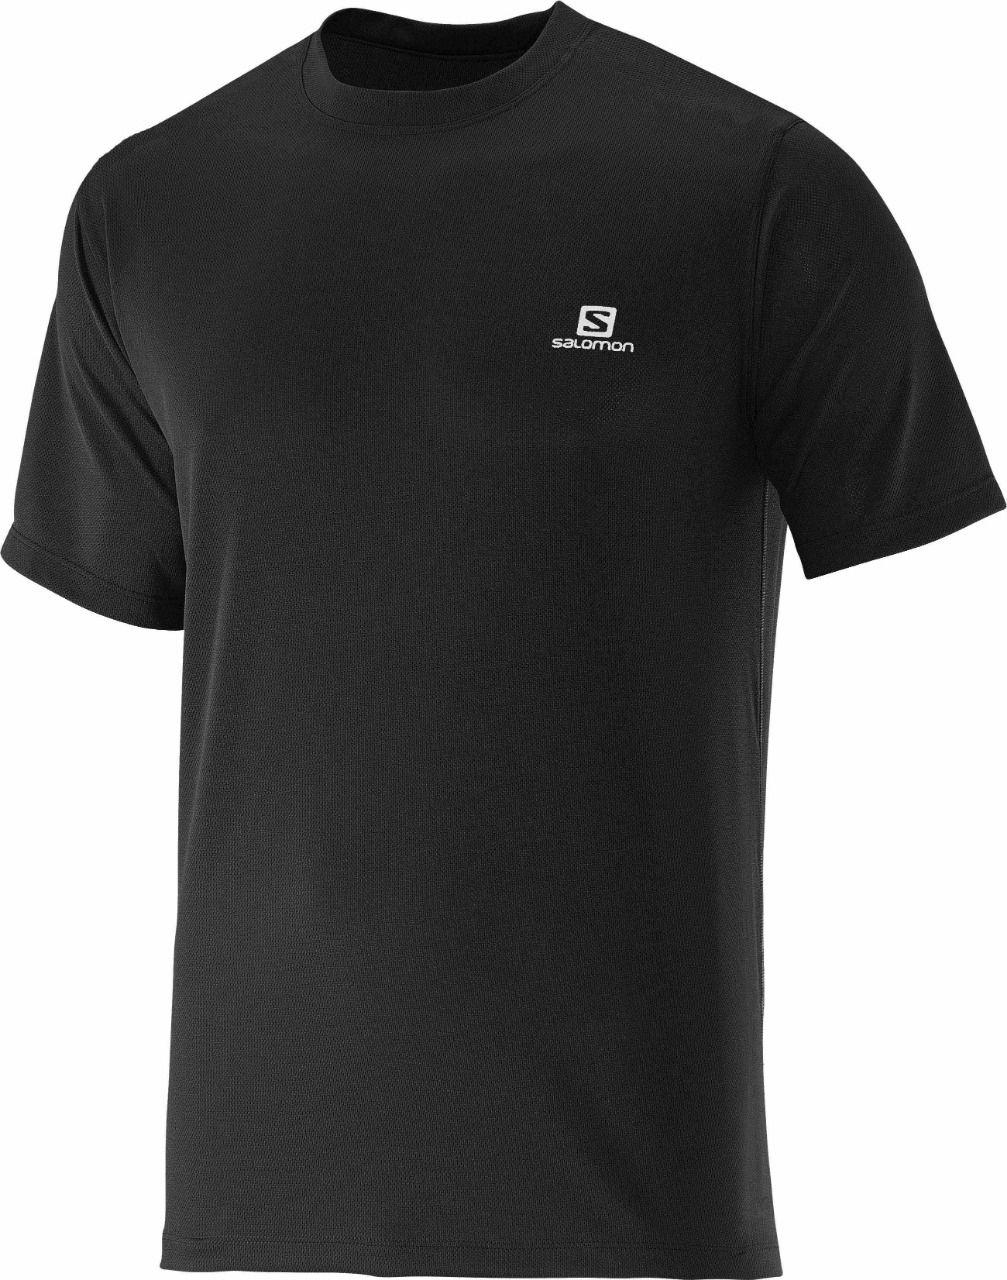 Camiseta Comet SS  Masculino Salomon